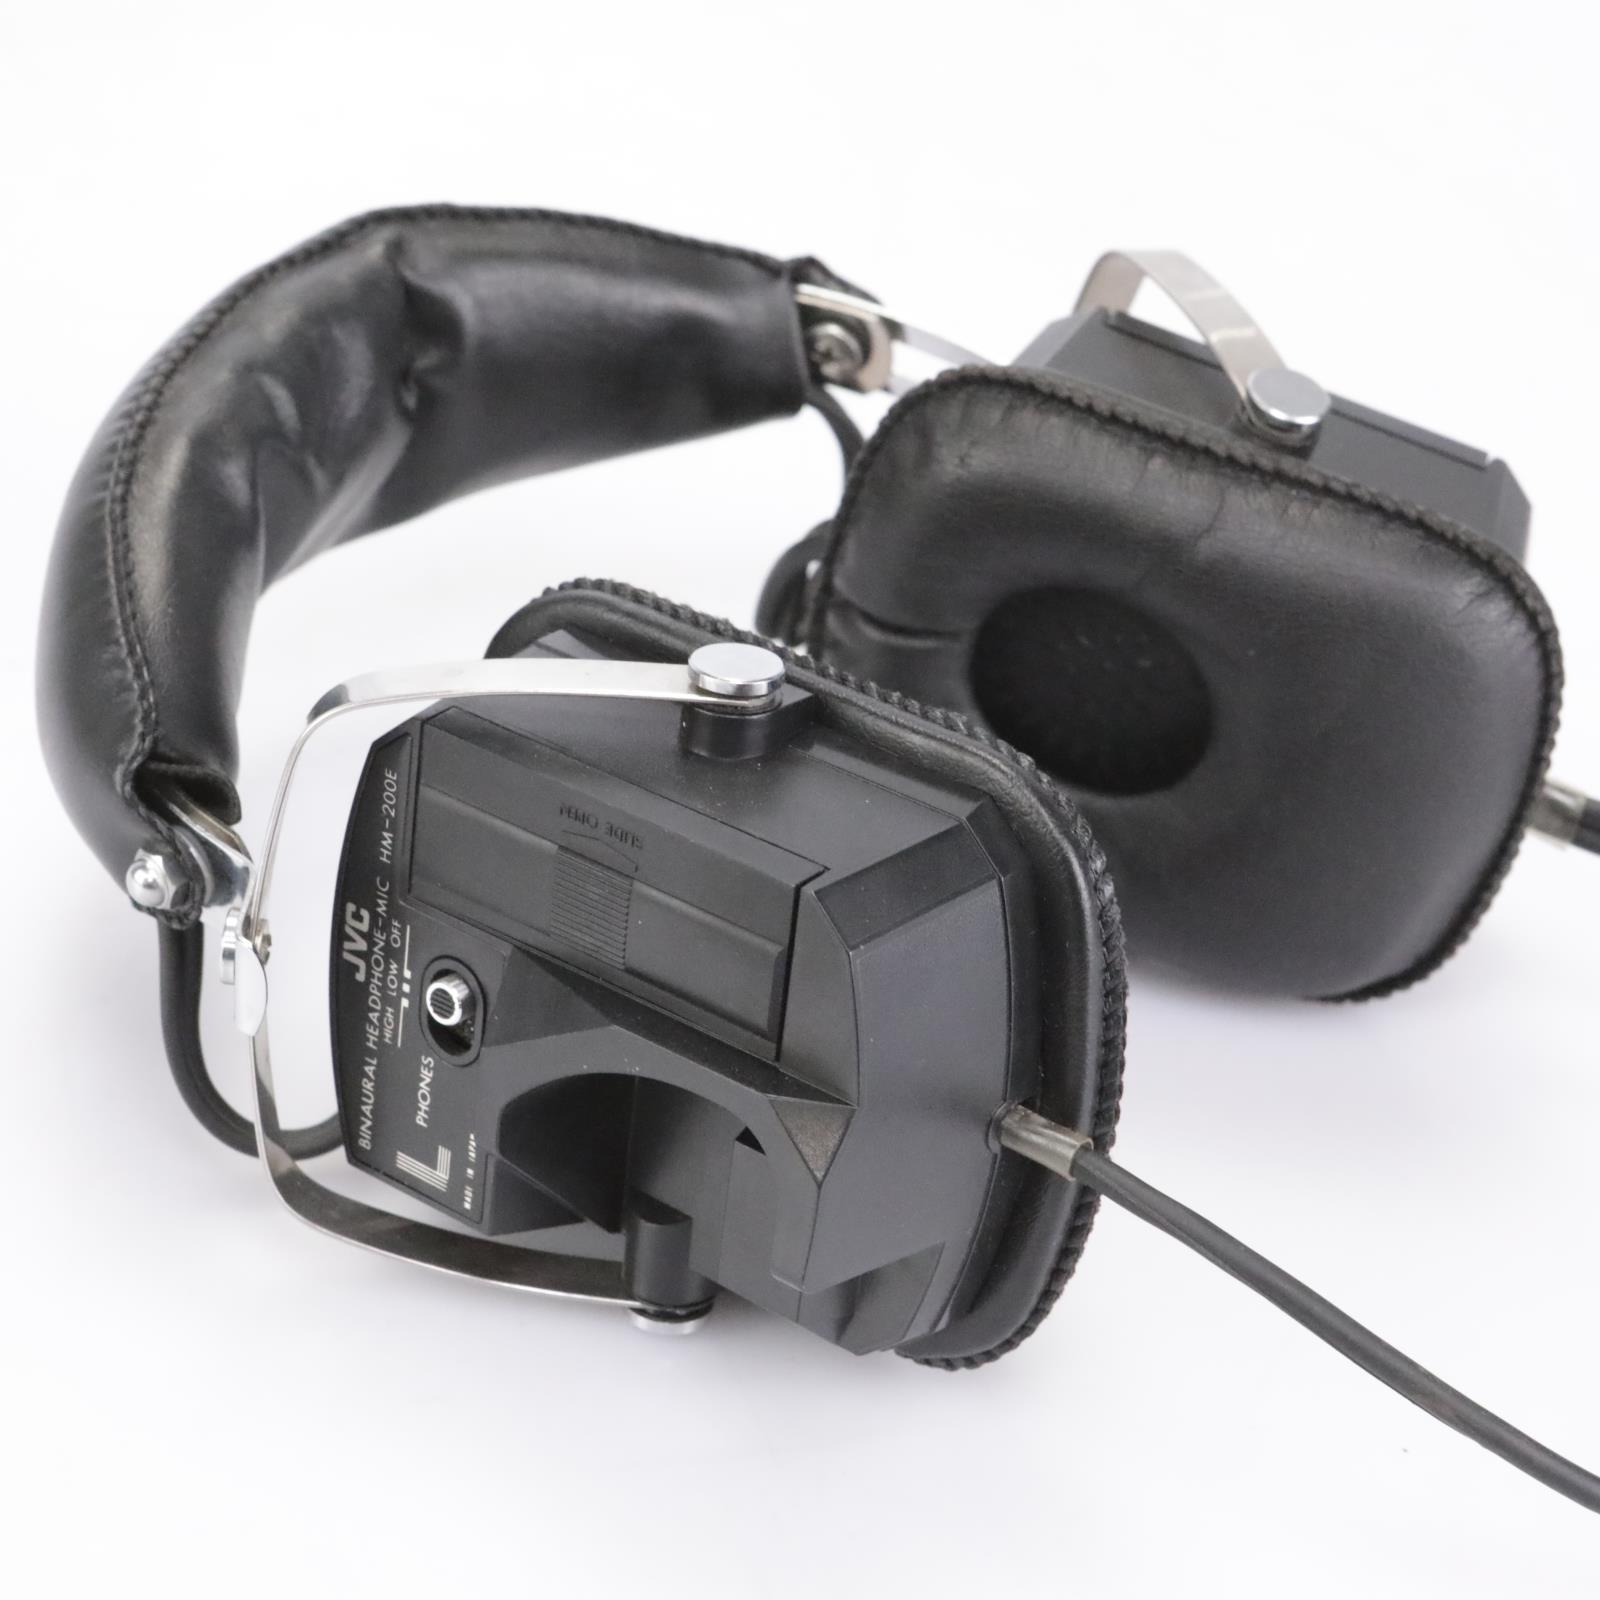 JVC HM-200E Binaural Headphones / Microphone Combination #43341